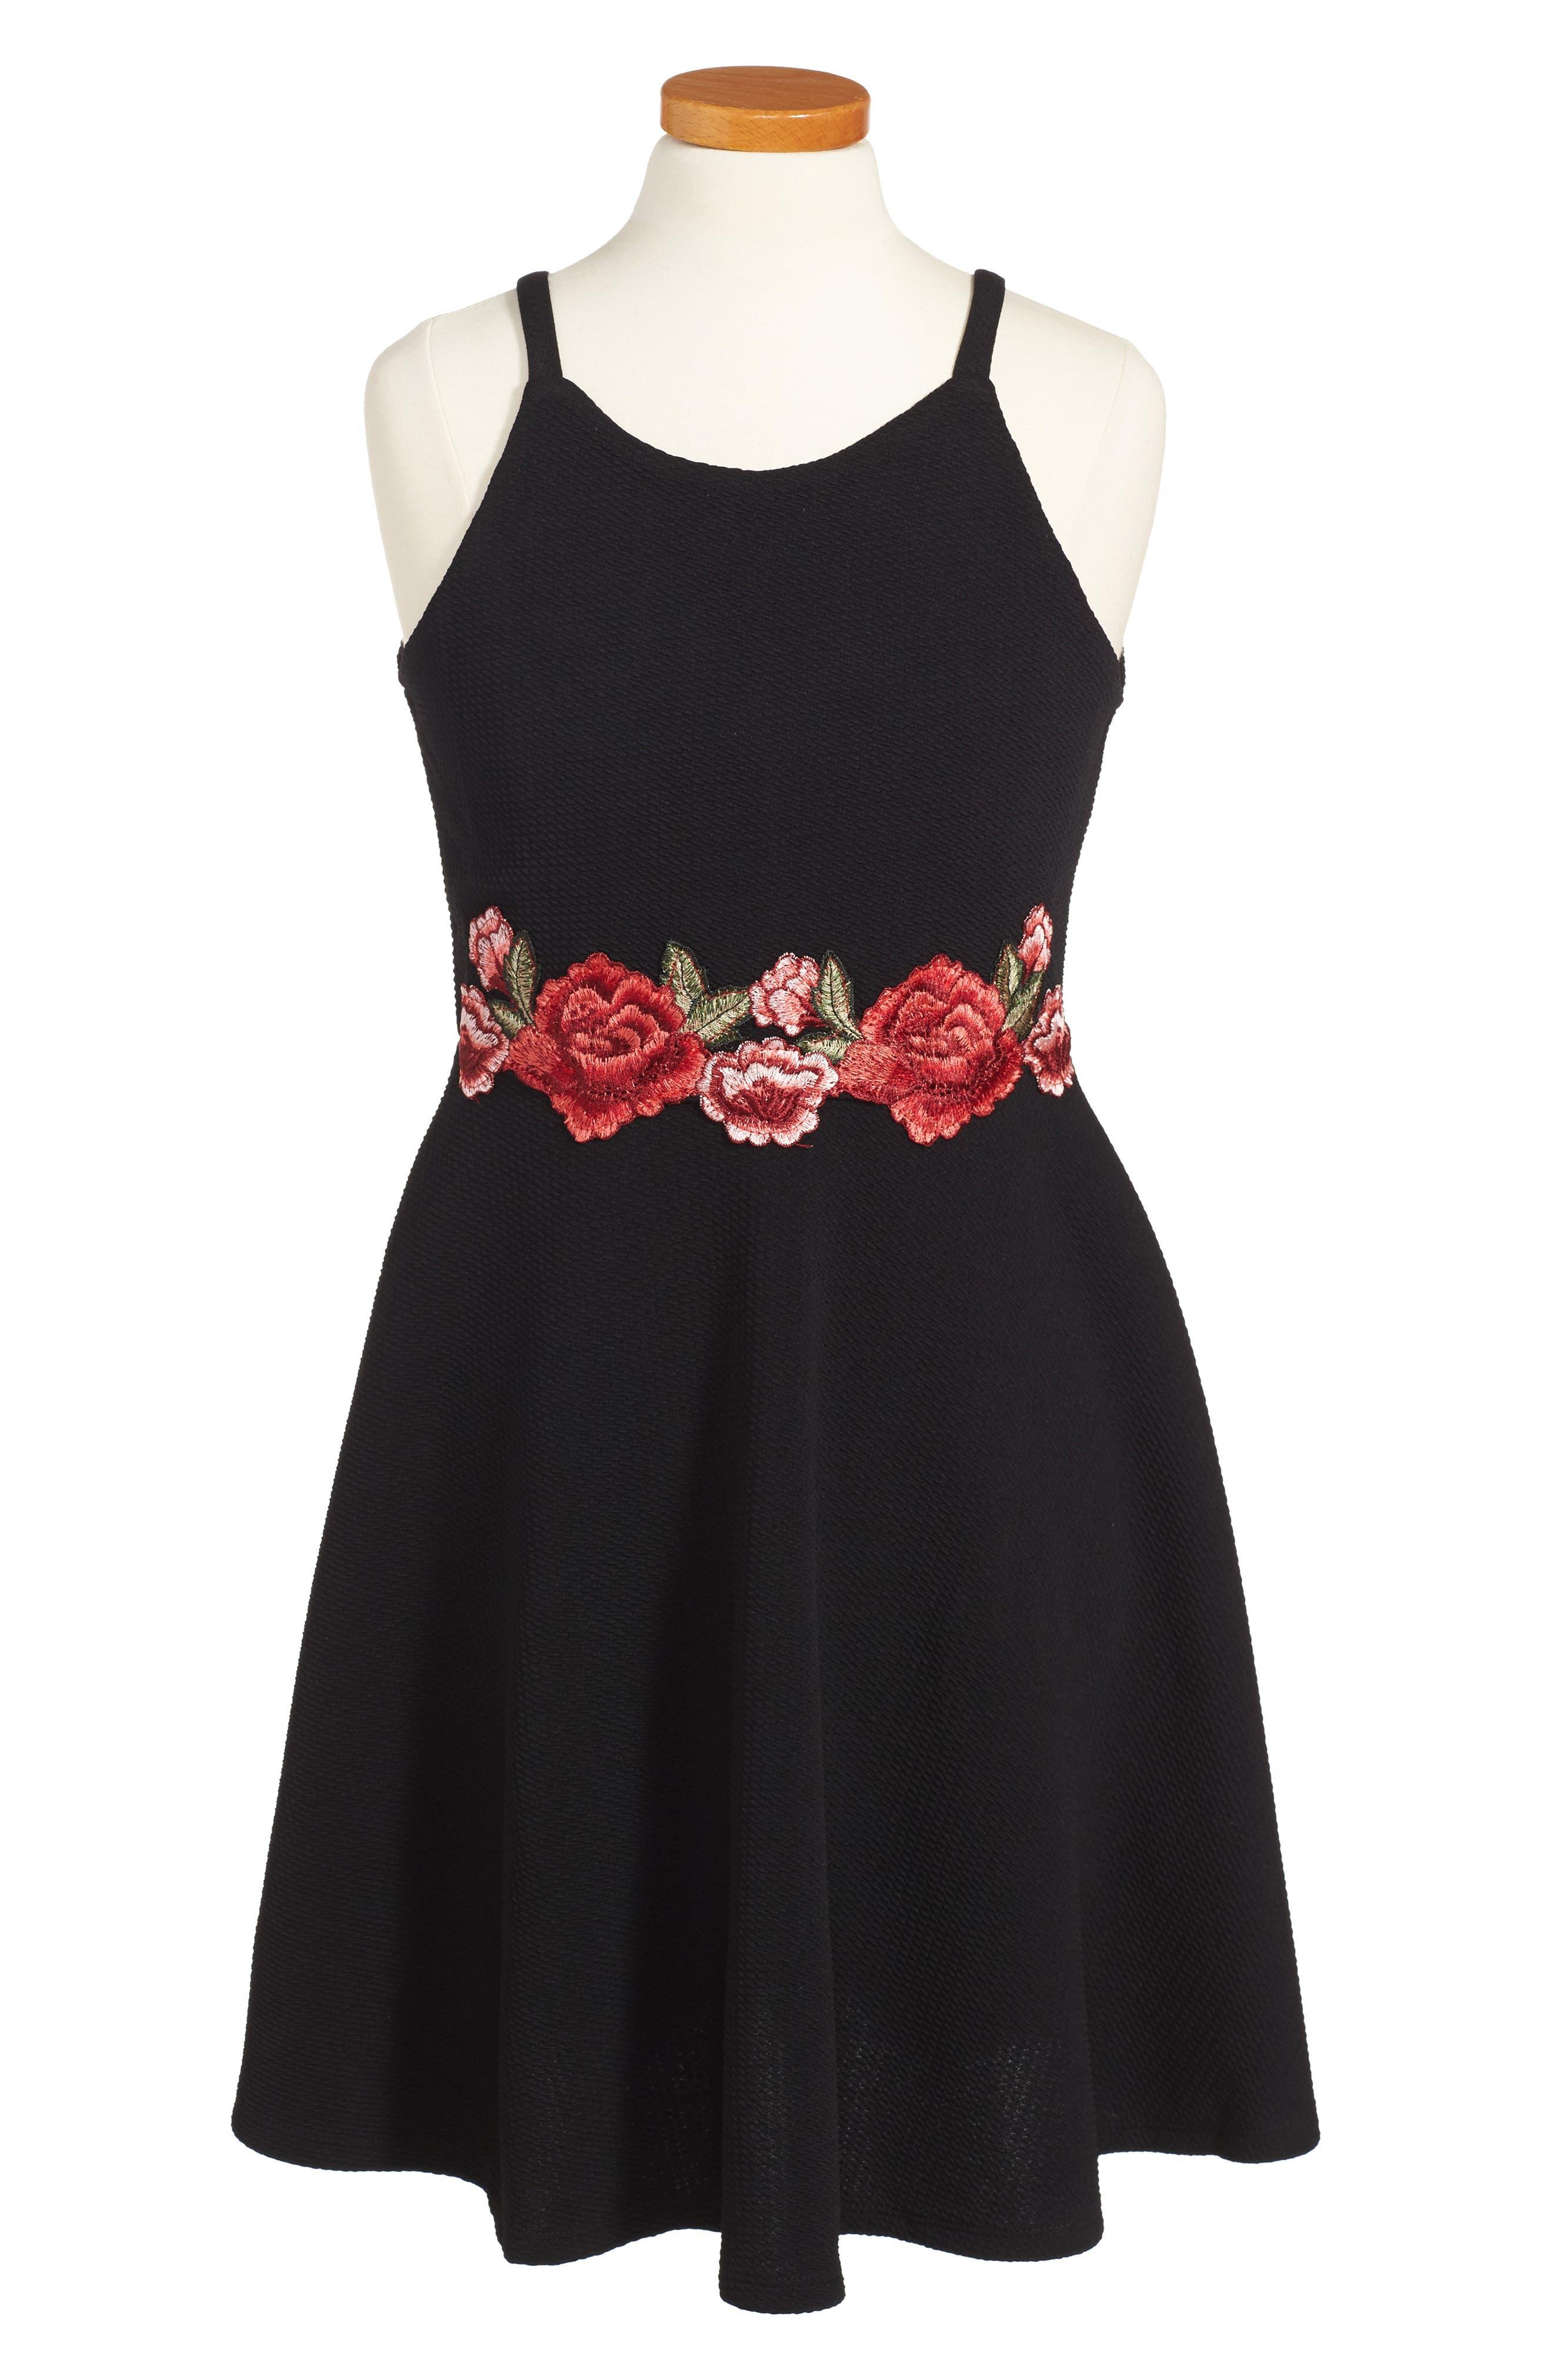 Main Image - Soprano Embroidered Skater Dress (Big Girls)